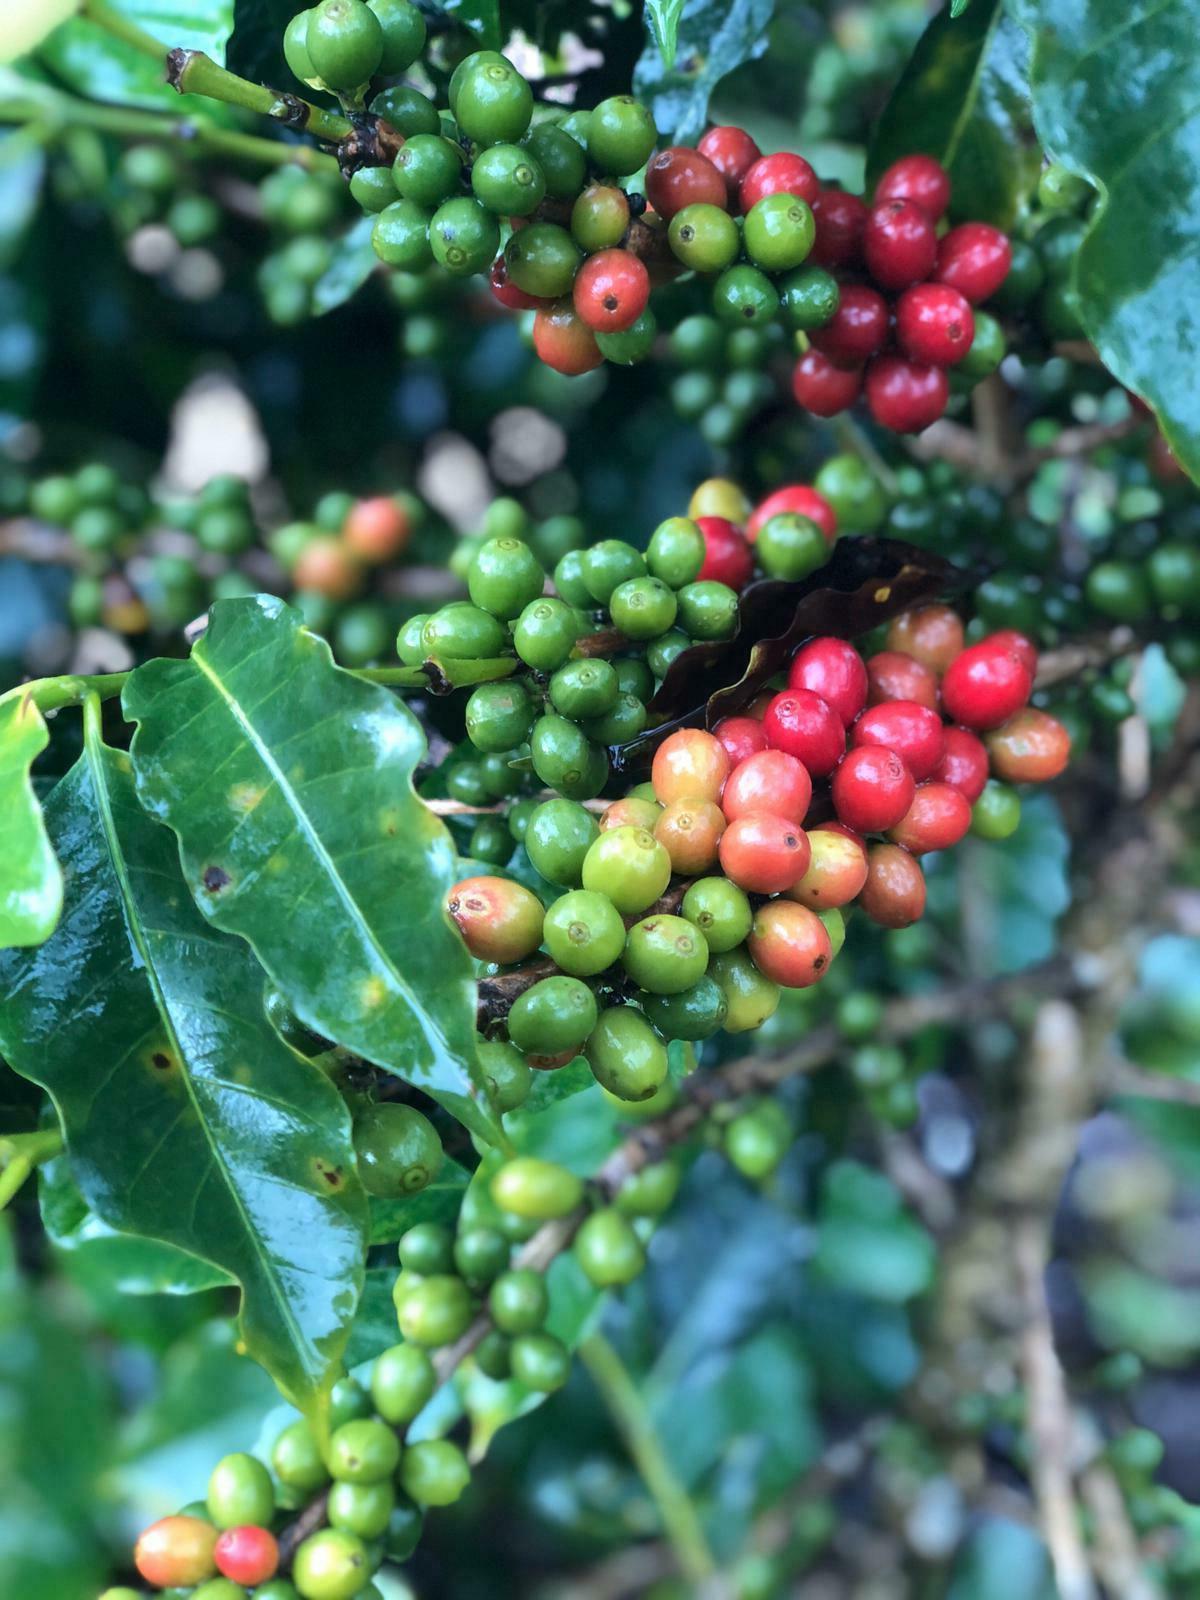 Panama Via Green Caturra lbs